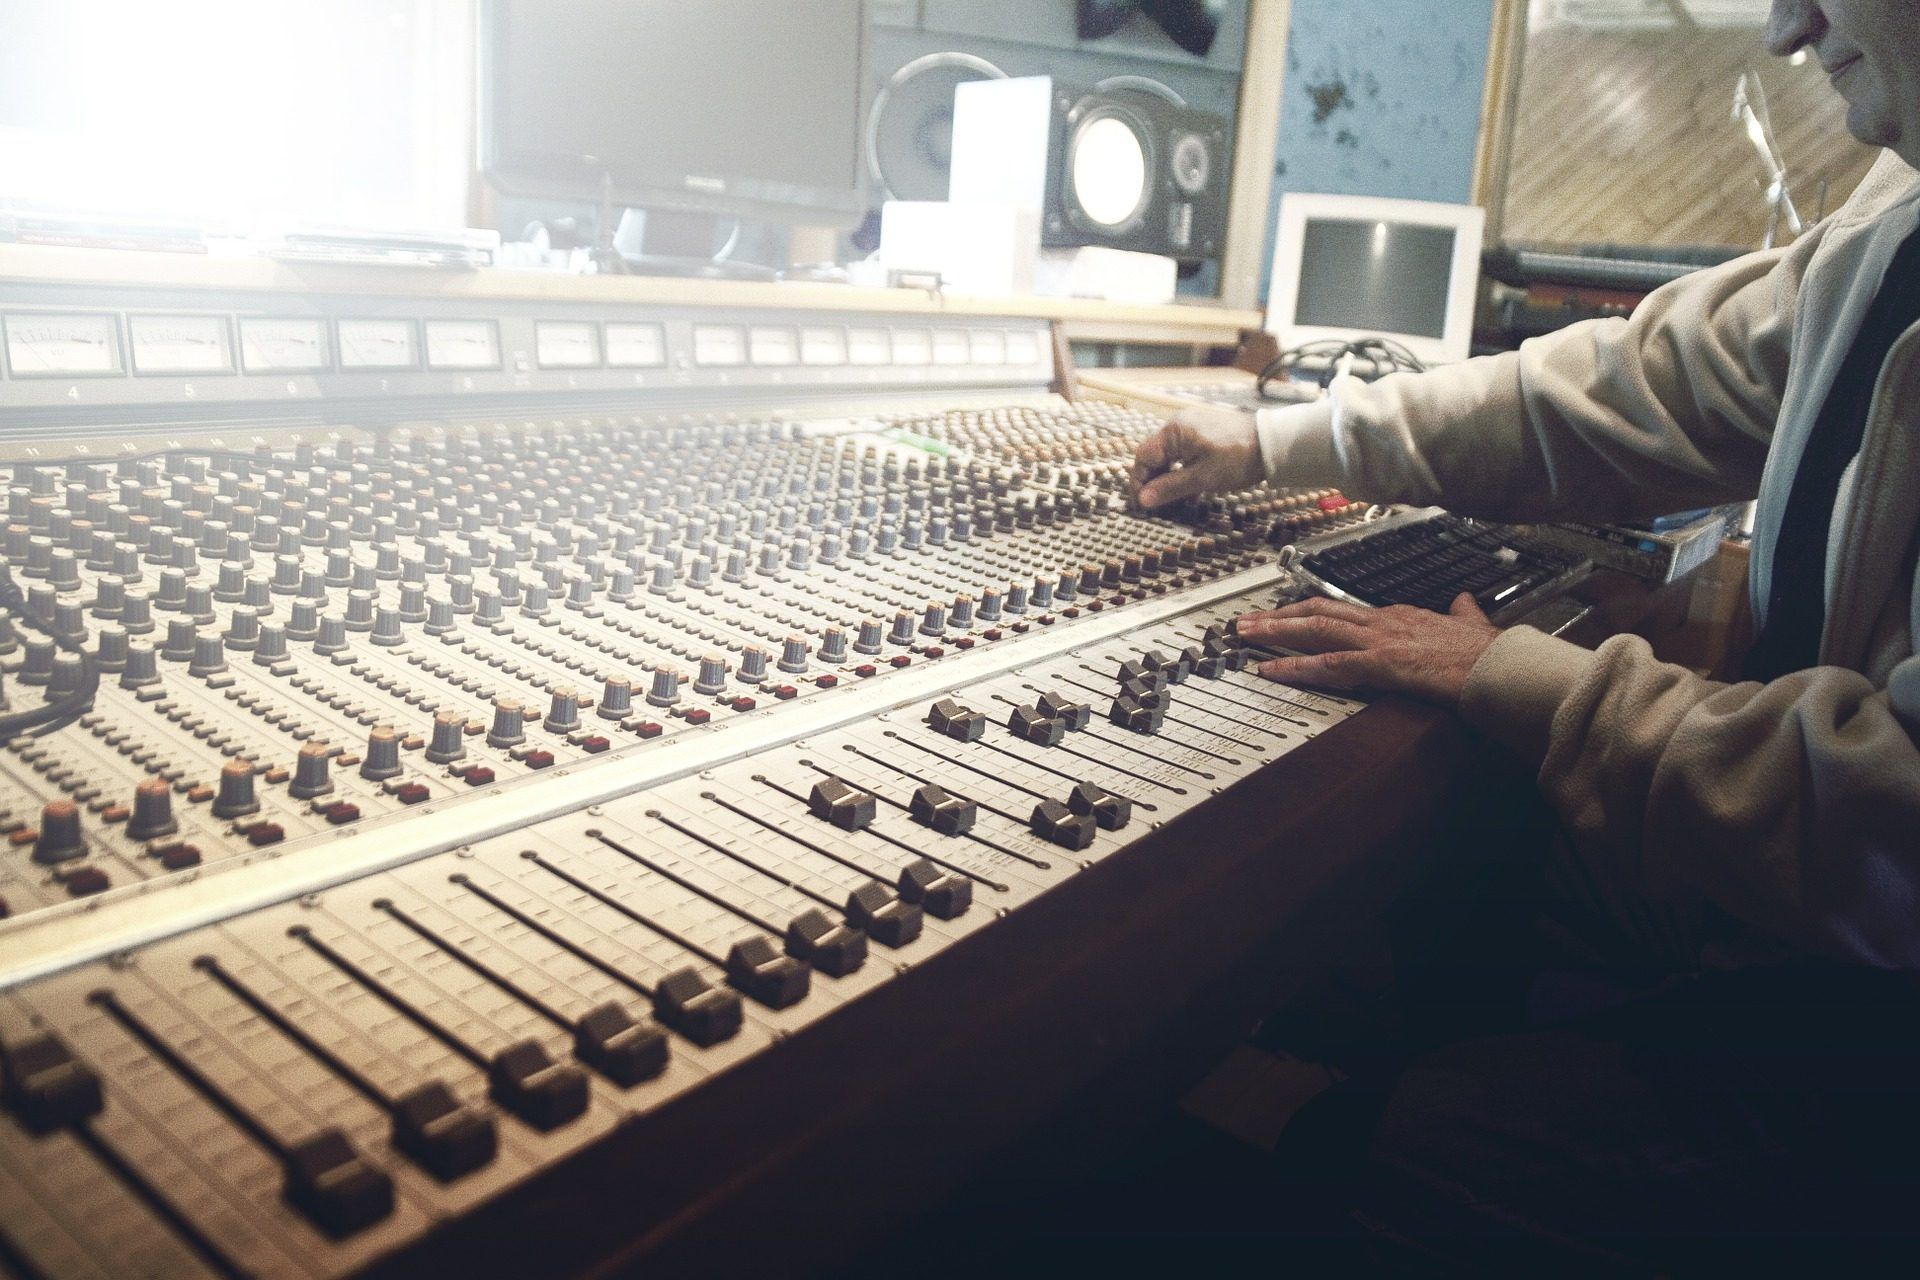 mesa, mezclas, sonidos, botones, canales - Fondos de Pantalla HD - professor-falken.com